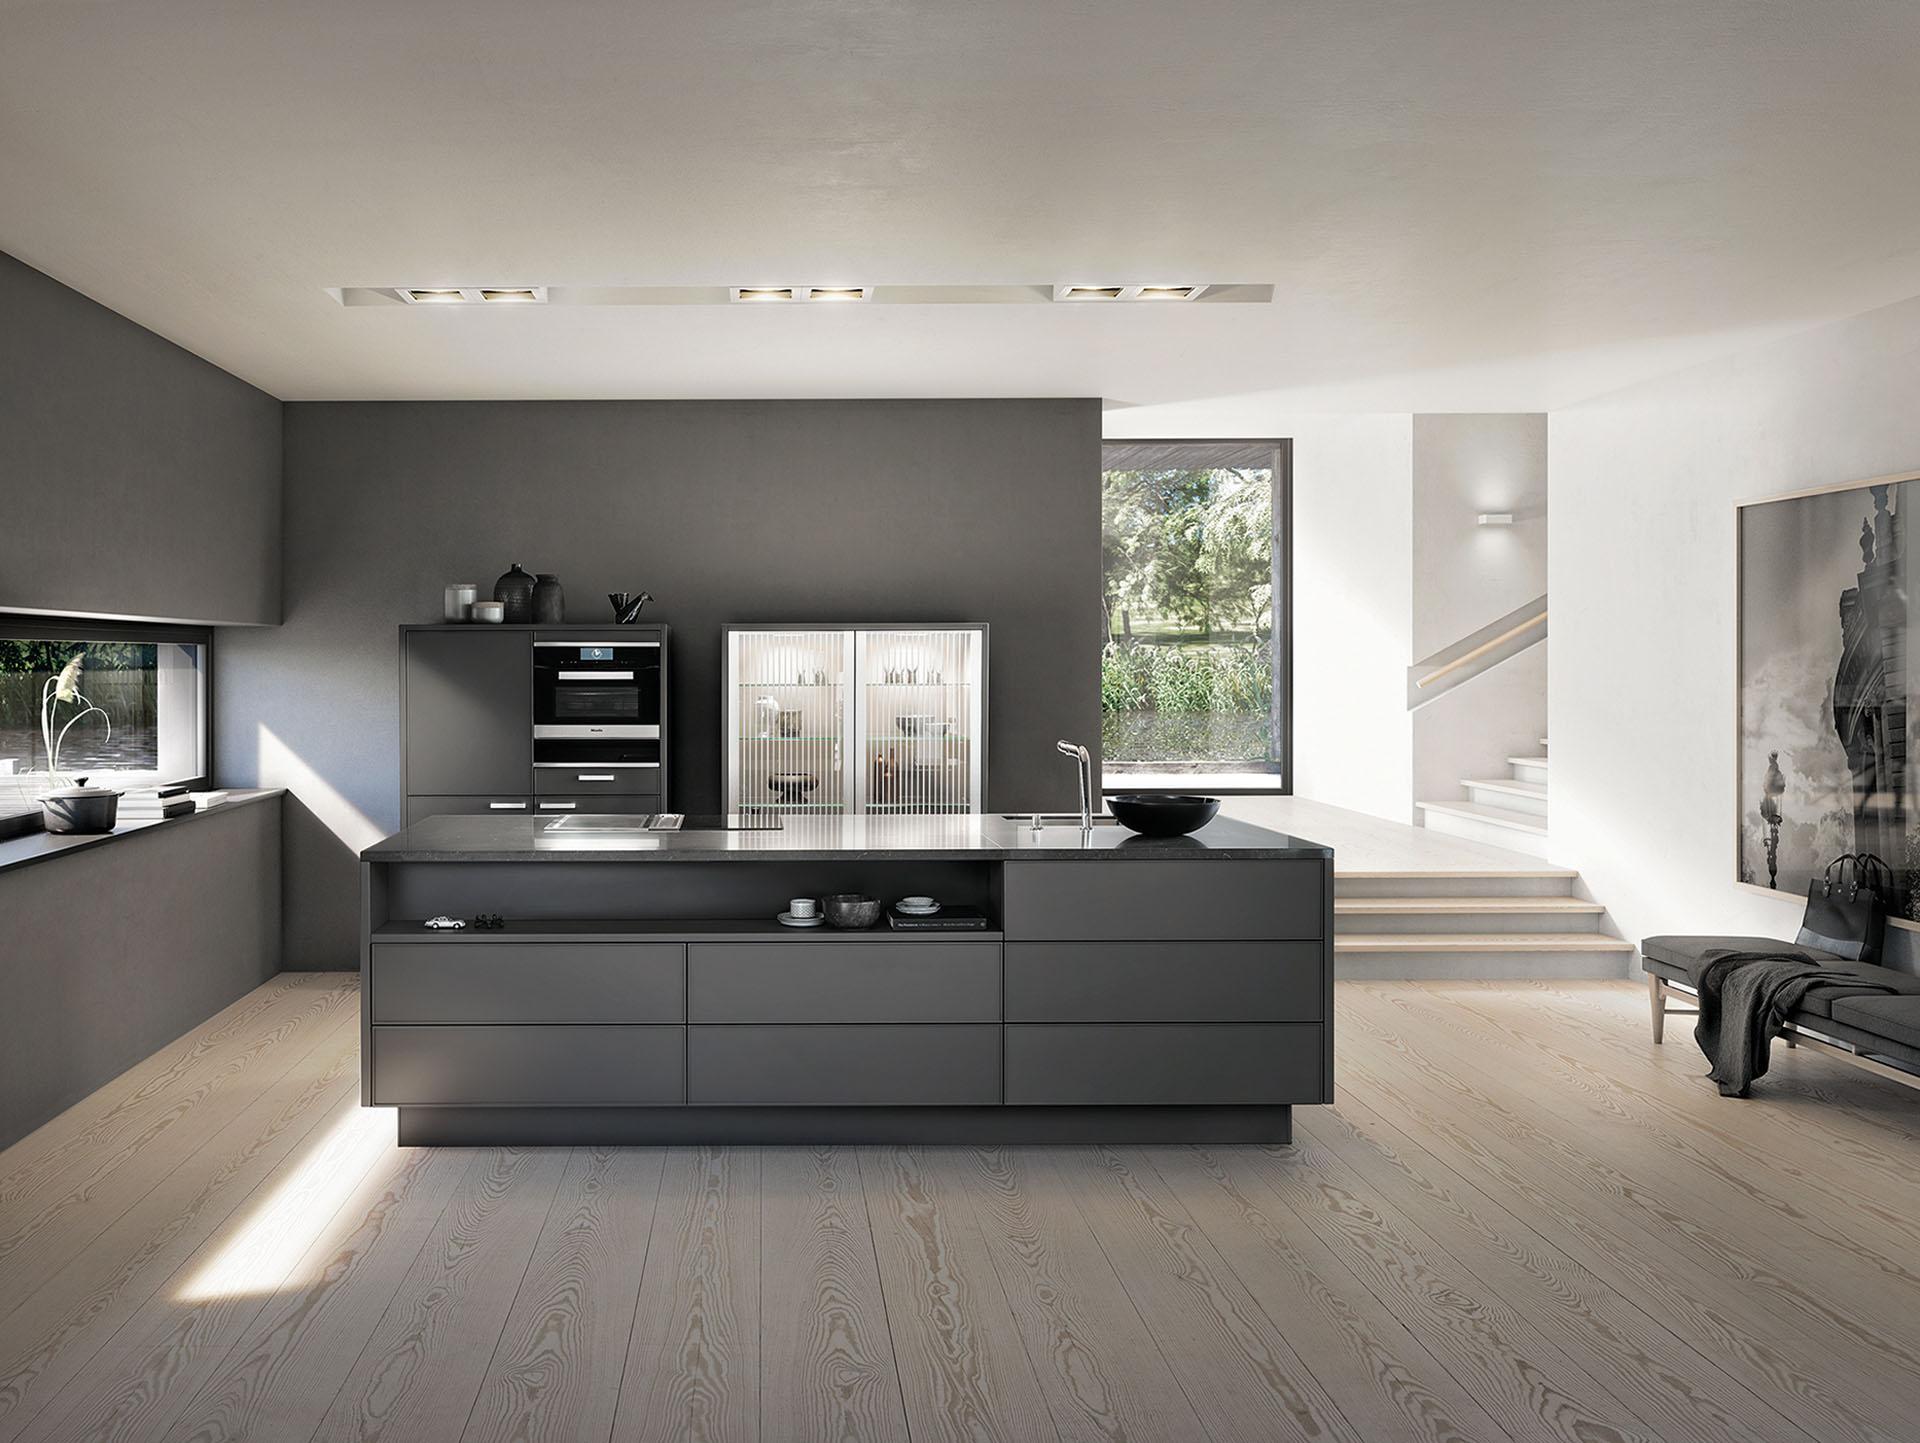 Home Design Keukens : Inkijk keuken villa serugrandi your home in curacao